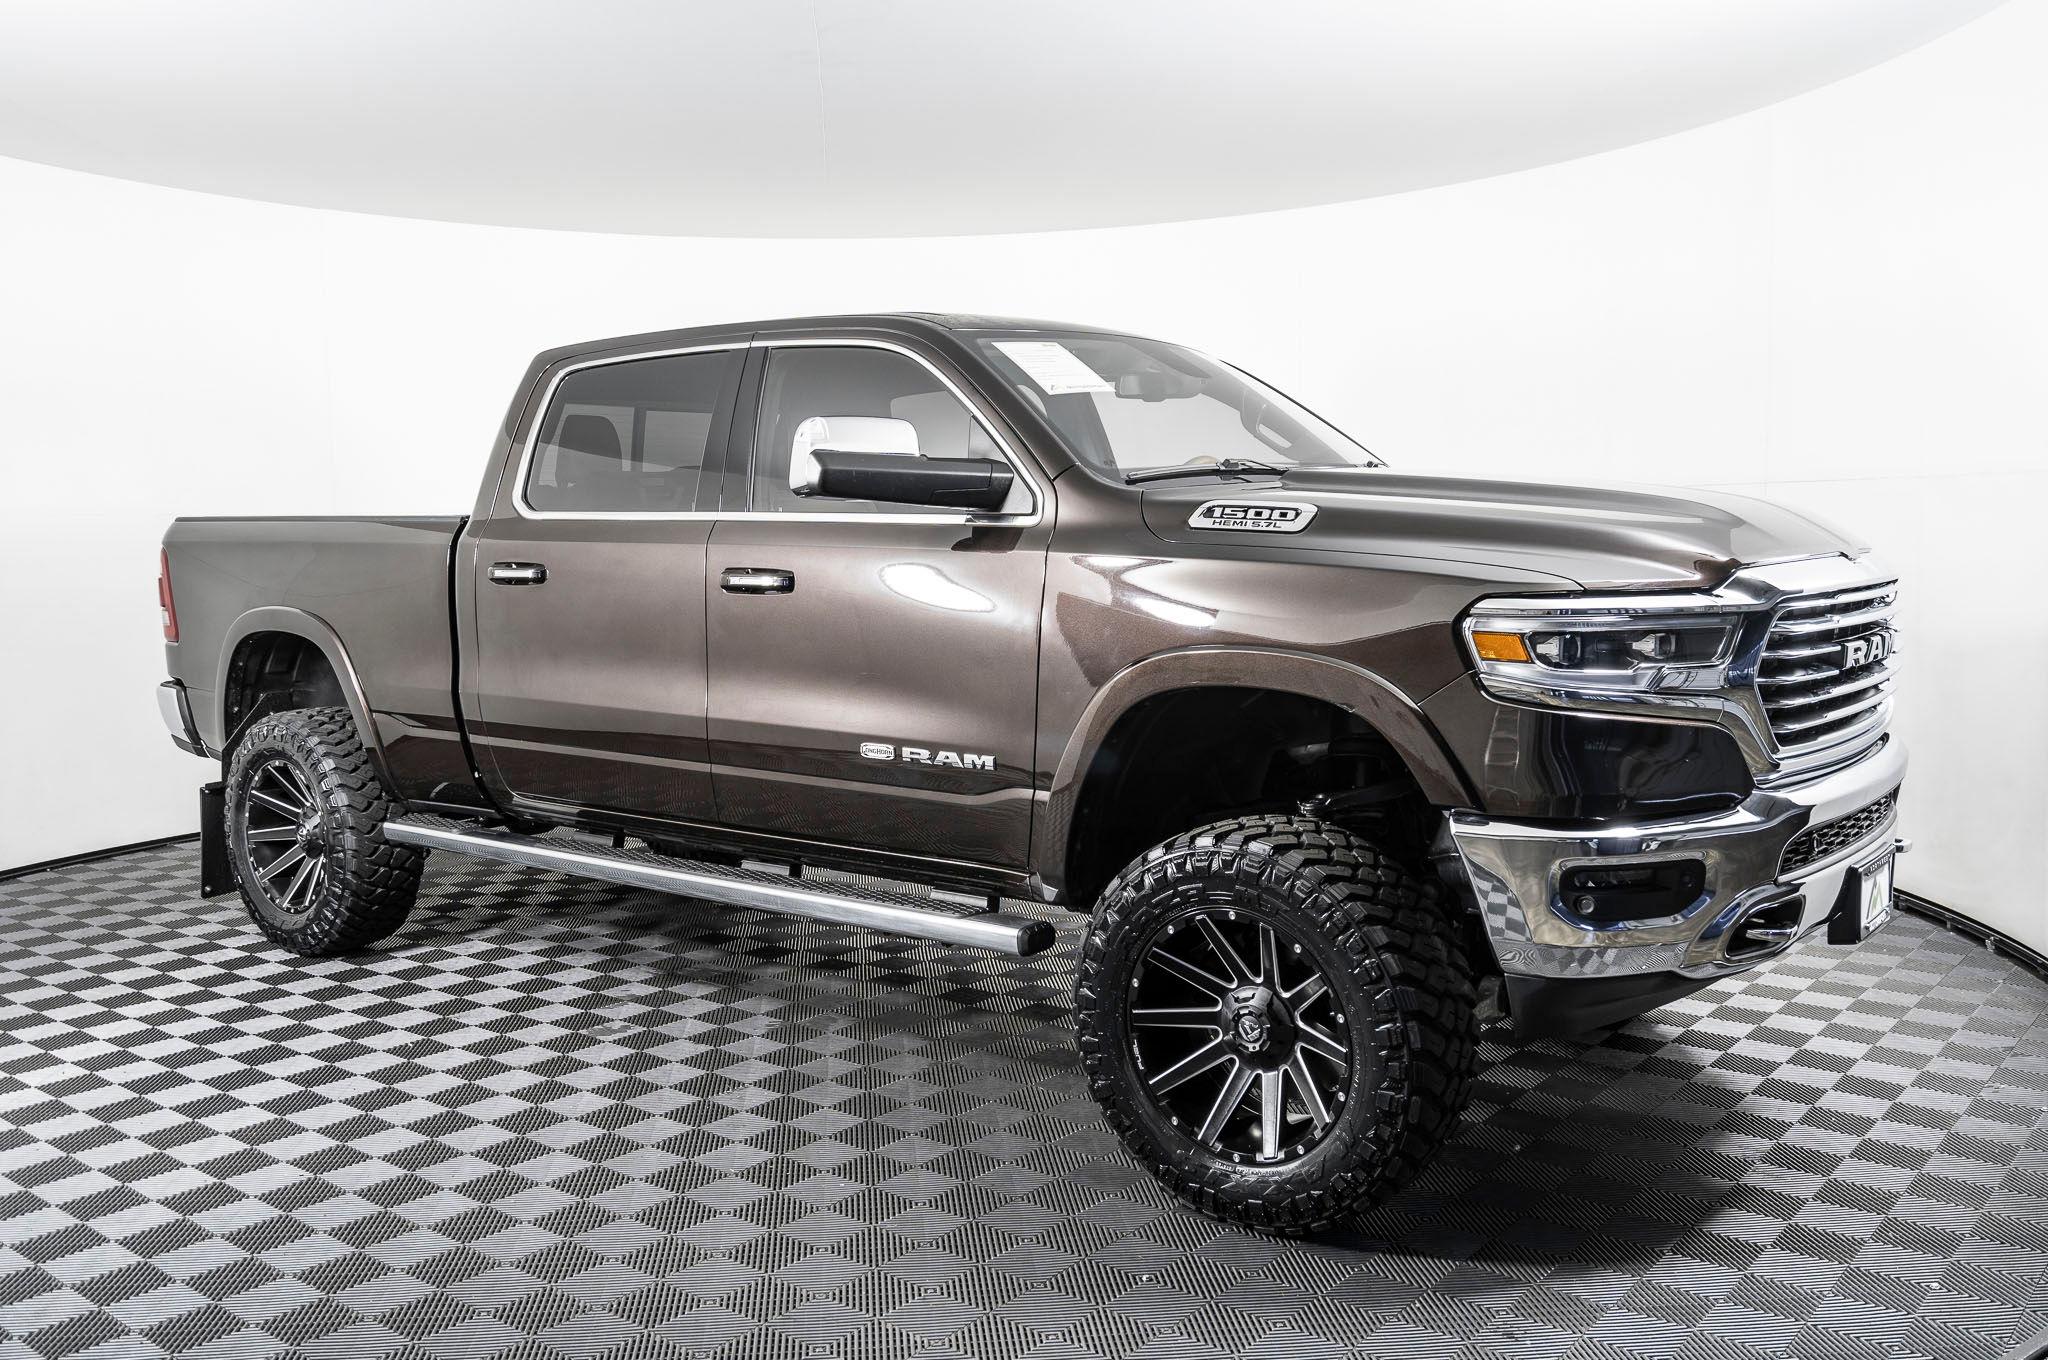 Used Lifted 2019 Dodge Ram 1500 Longhorn 4x4 Truck For Sale Northwest Motorsport